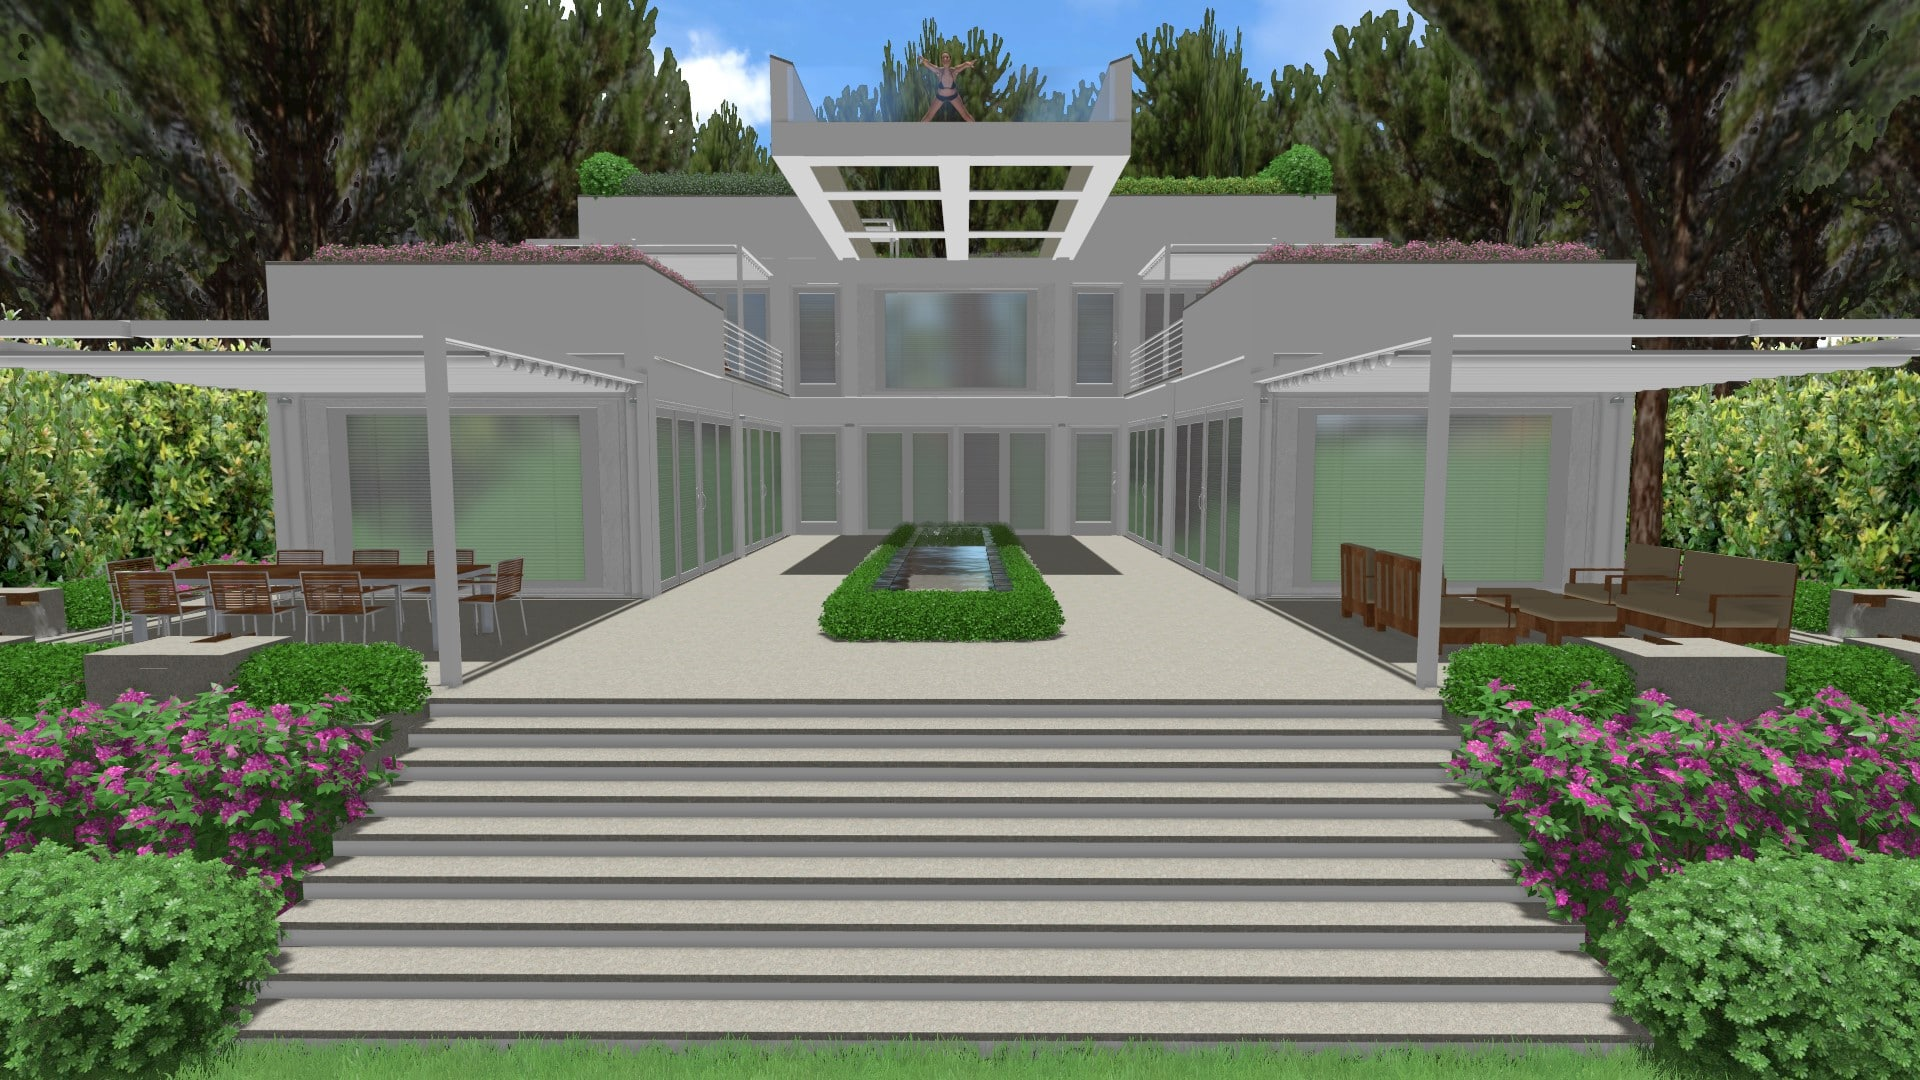 Emejing Giardini Sul Terrazzo Photos - Idee Arredamento Casa ...